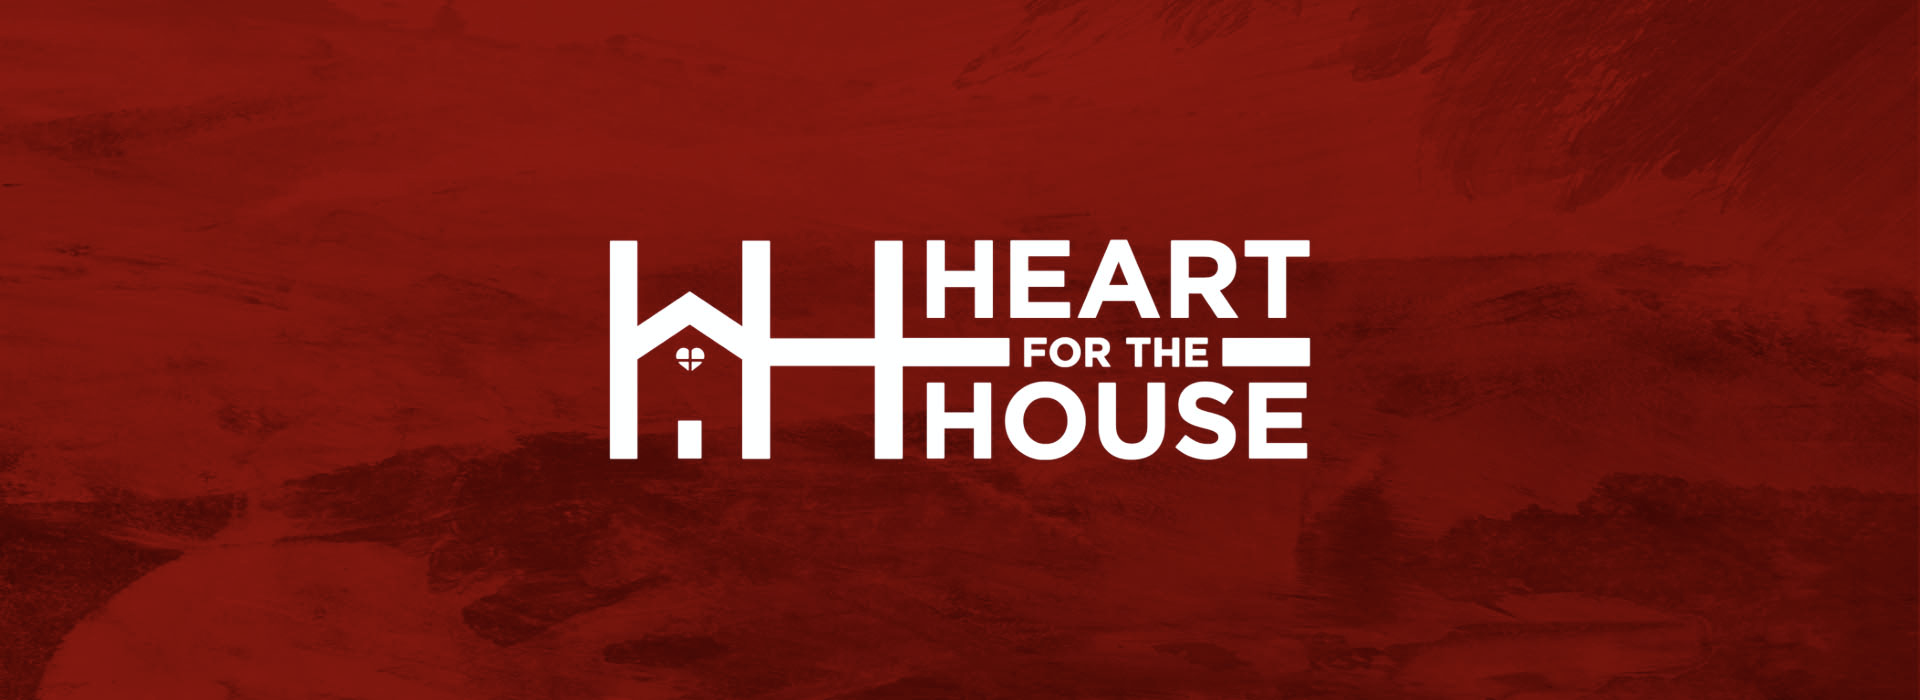 heartforthehouse_hero